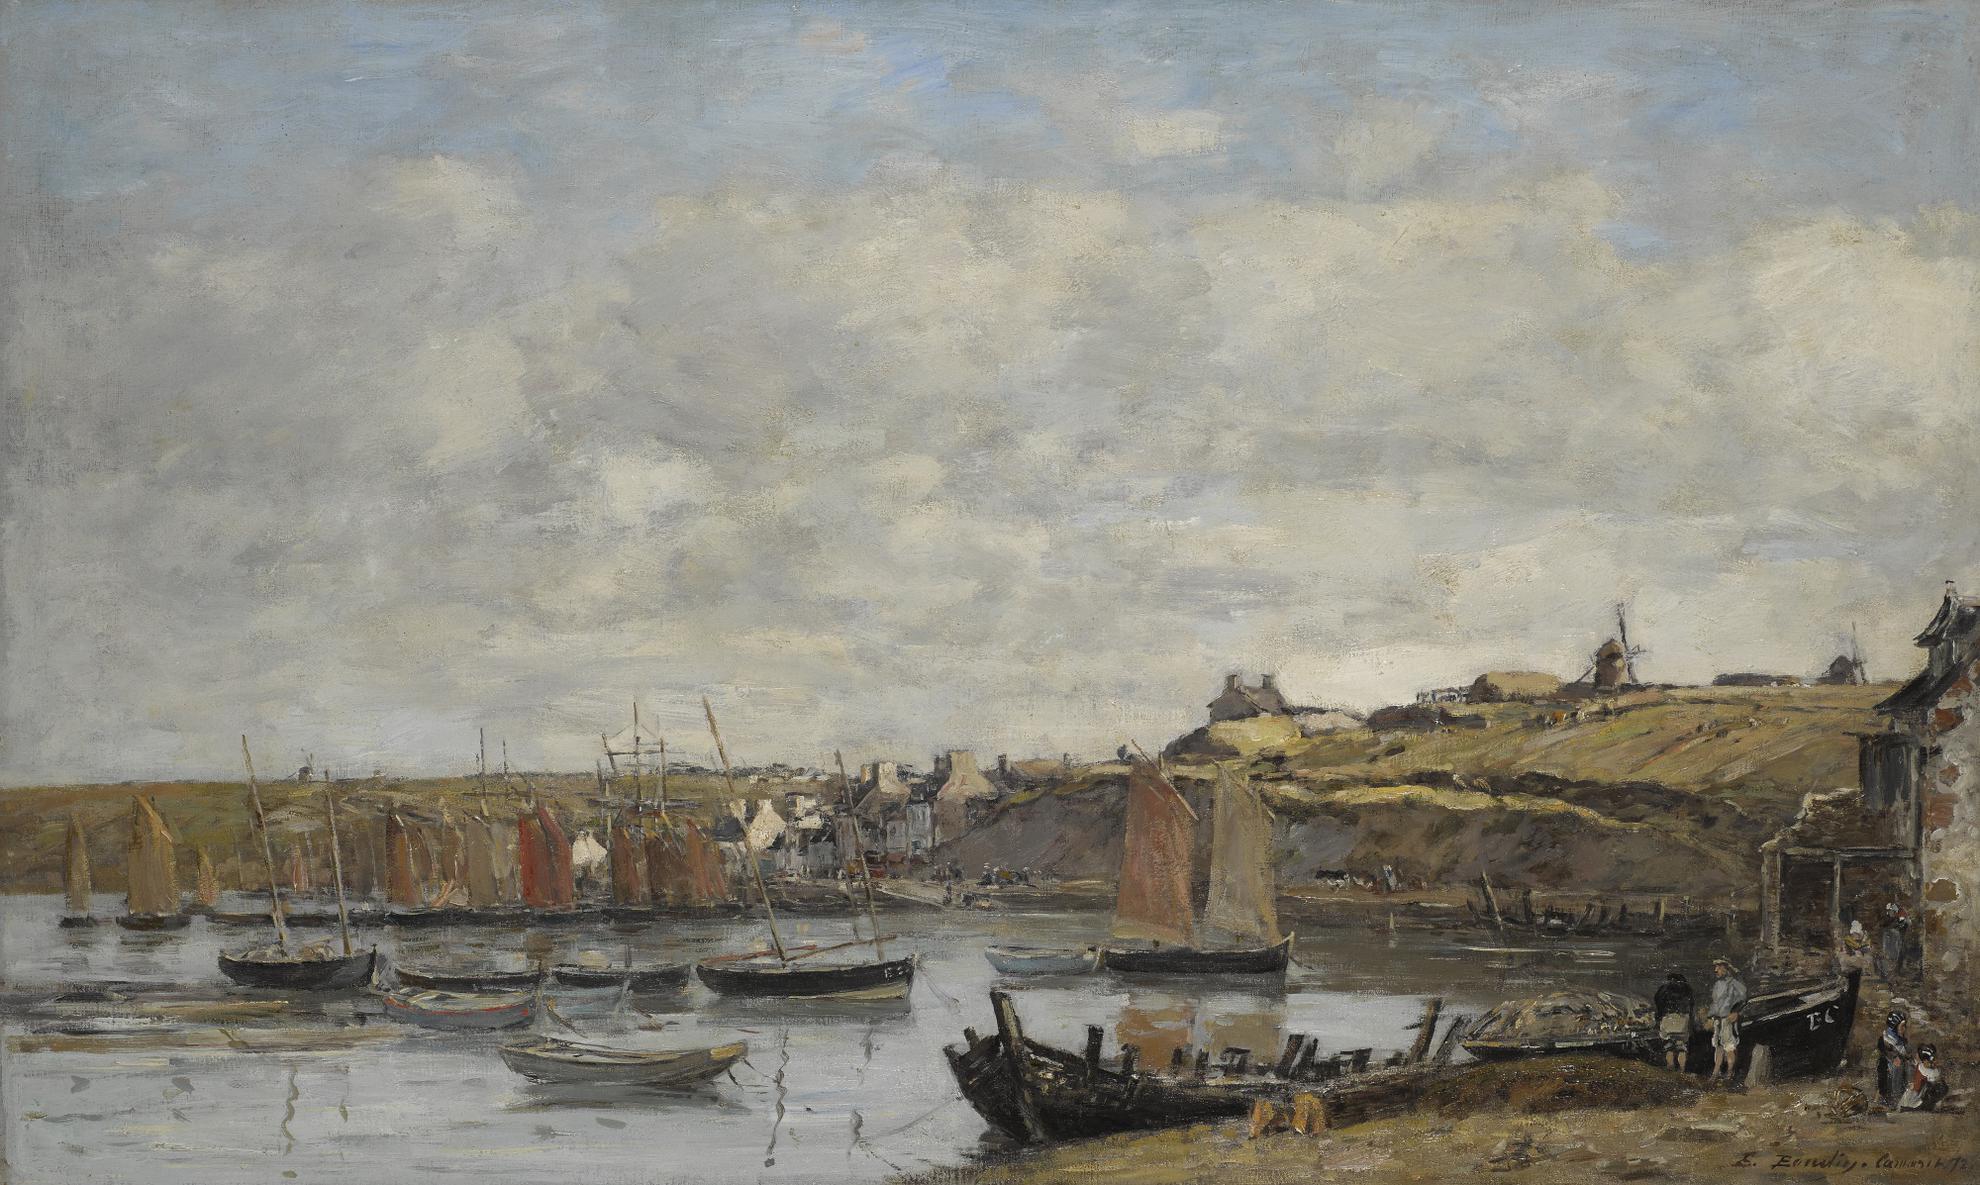 Eugene Louis Boudin-Camaret, Le Port-1872